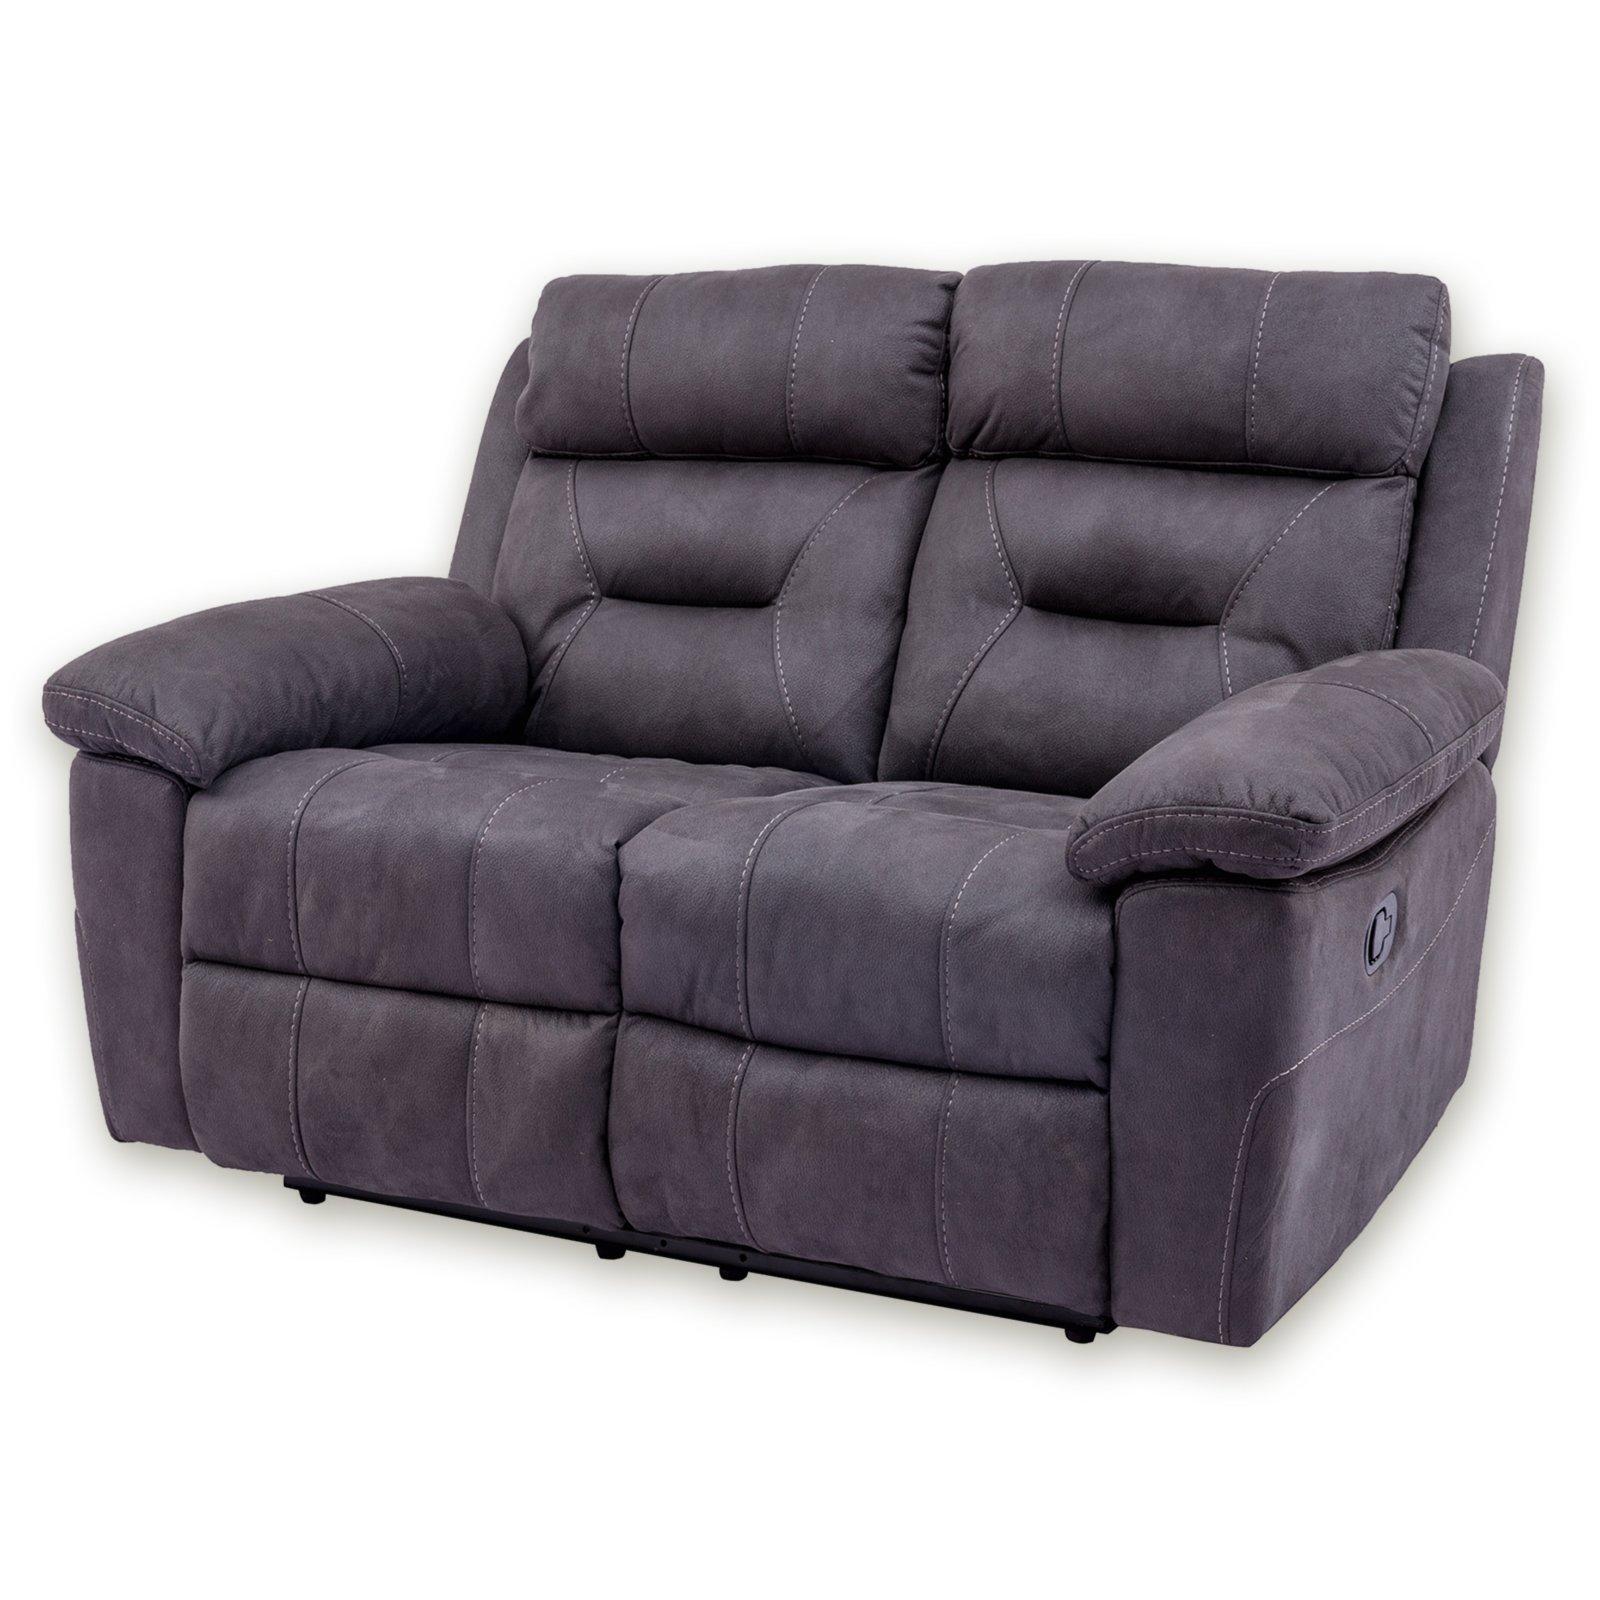 sofa 2 sitzer grau mit relaxfunktion 145 cm breit. Black Bedroom Furniture Sets. Home Design Ideas